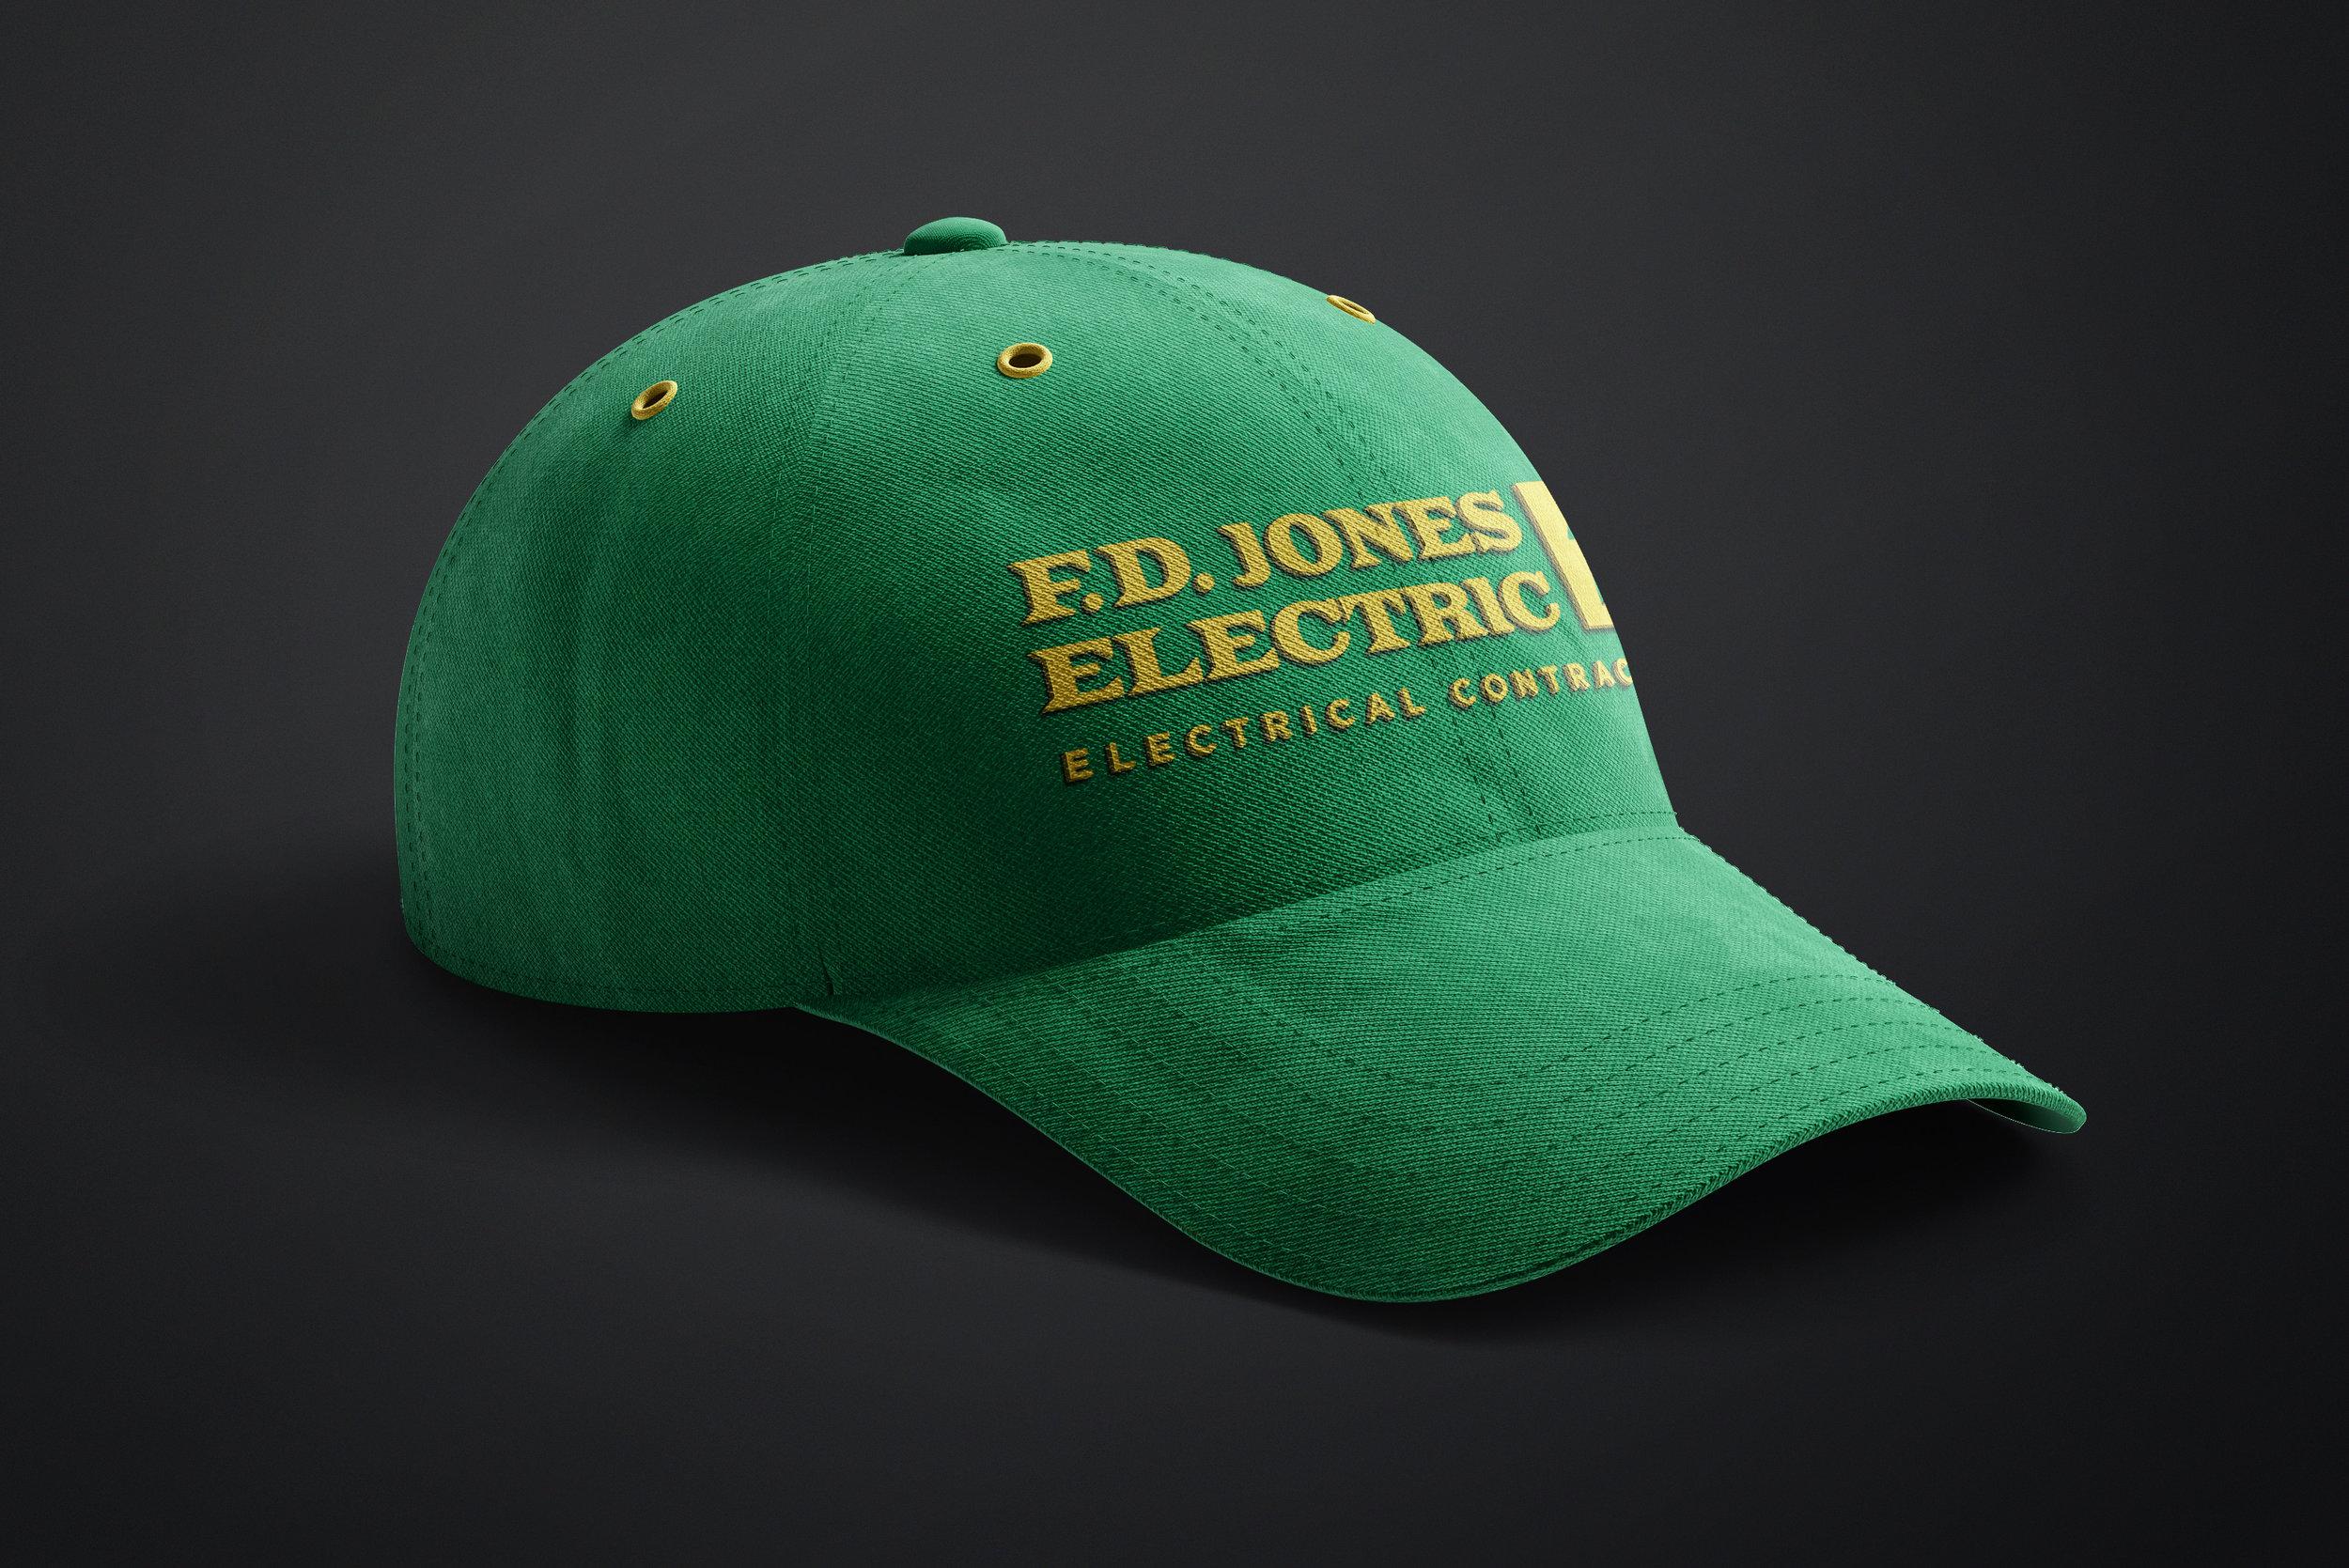 fd_jones_electric_embroidered_cap